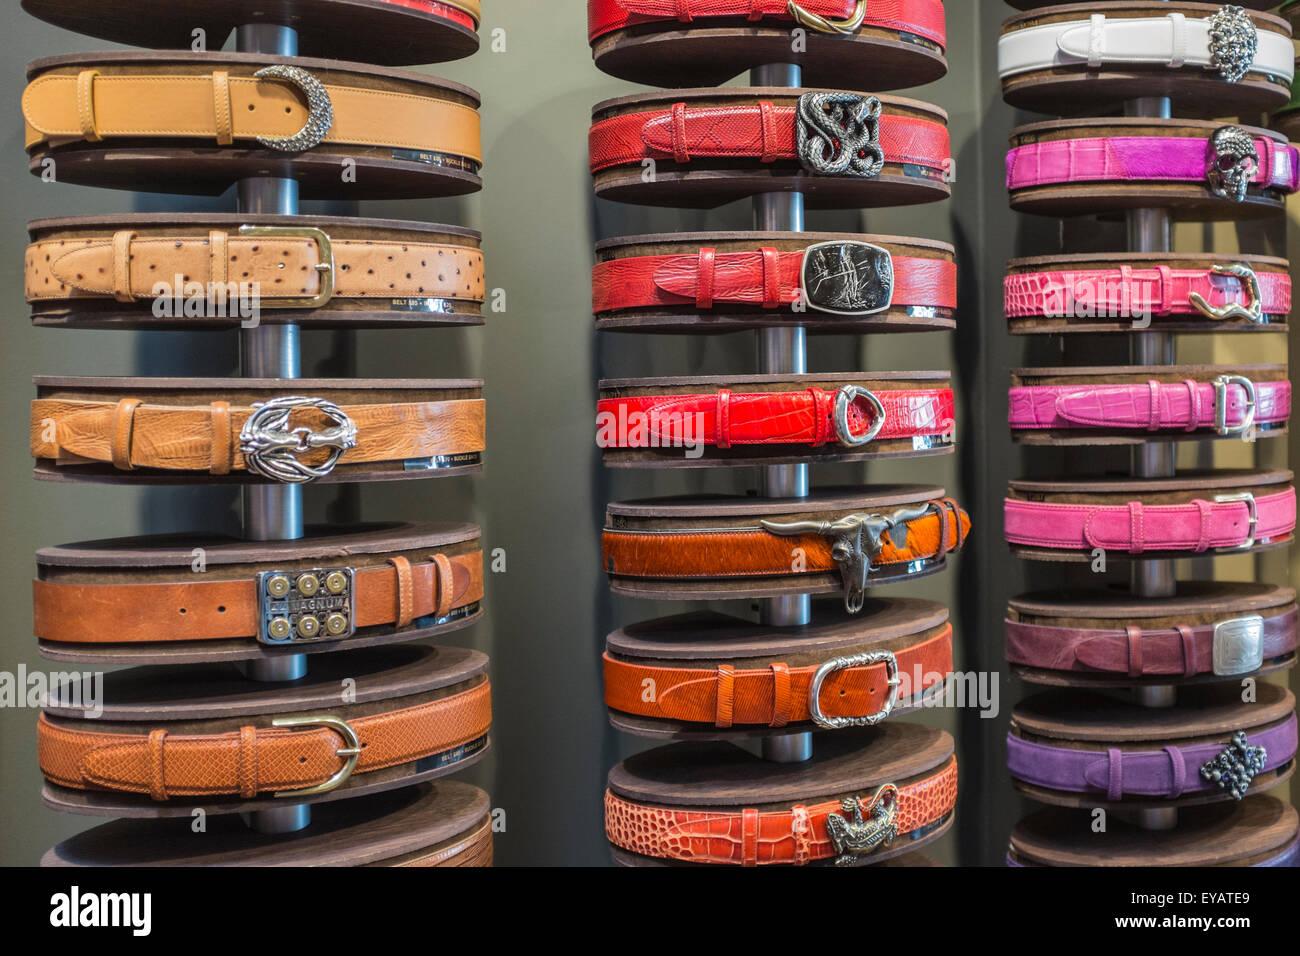 Belts lined on shelves - Stock Image